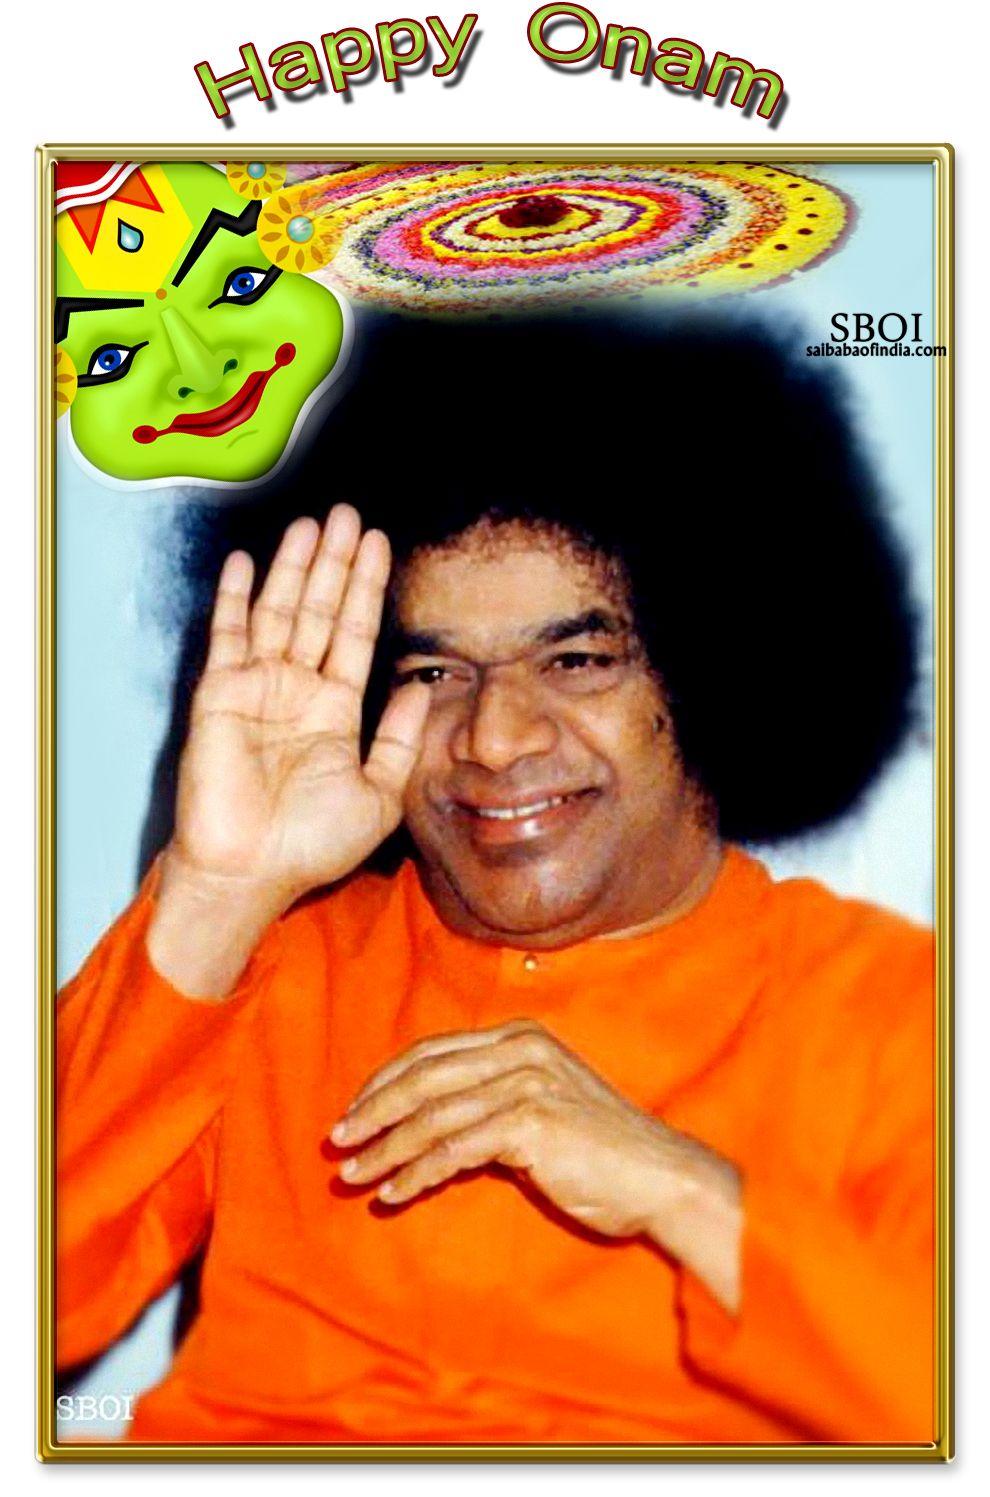 Pin by Sai Ram SBOI on Sathya Sai Baba Photos & Quotes